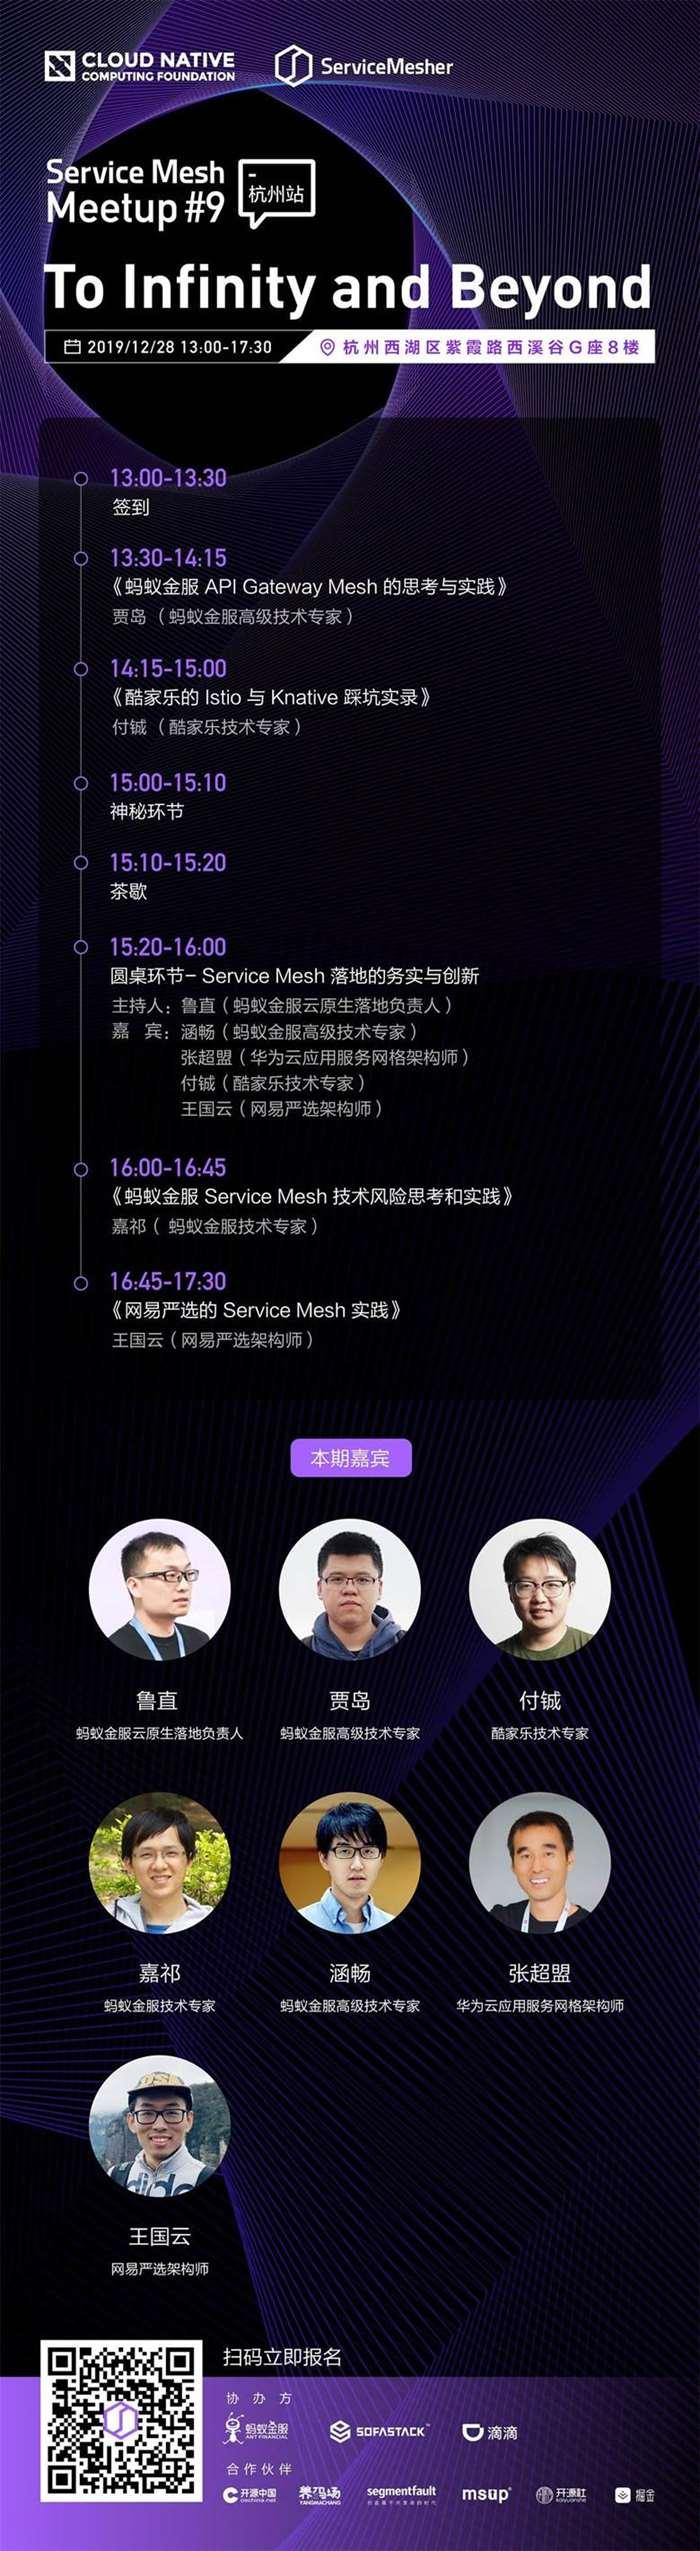 ServiceMesh线上海报-活动行_画板 1 副本 2.jpg